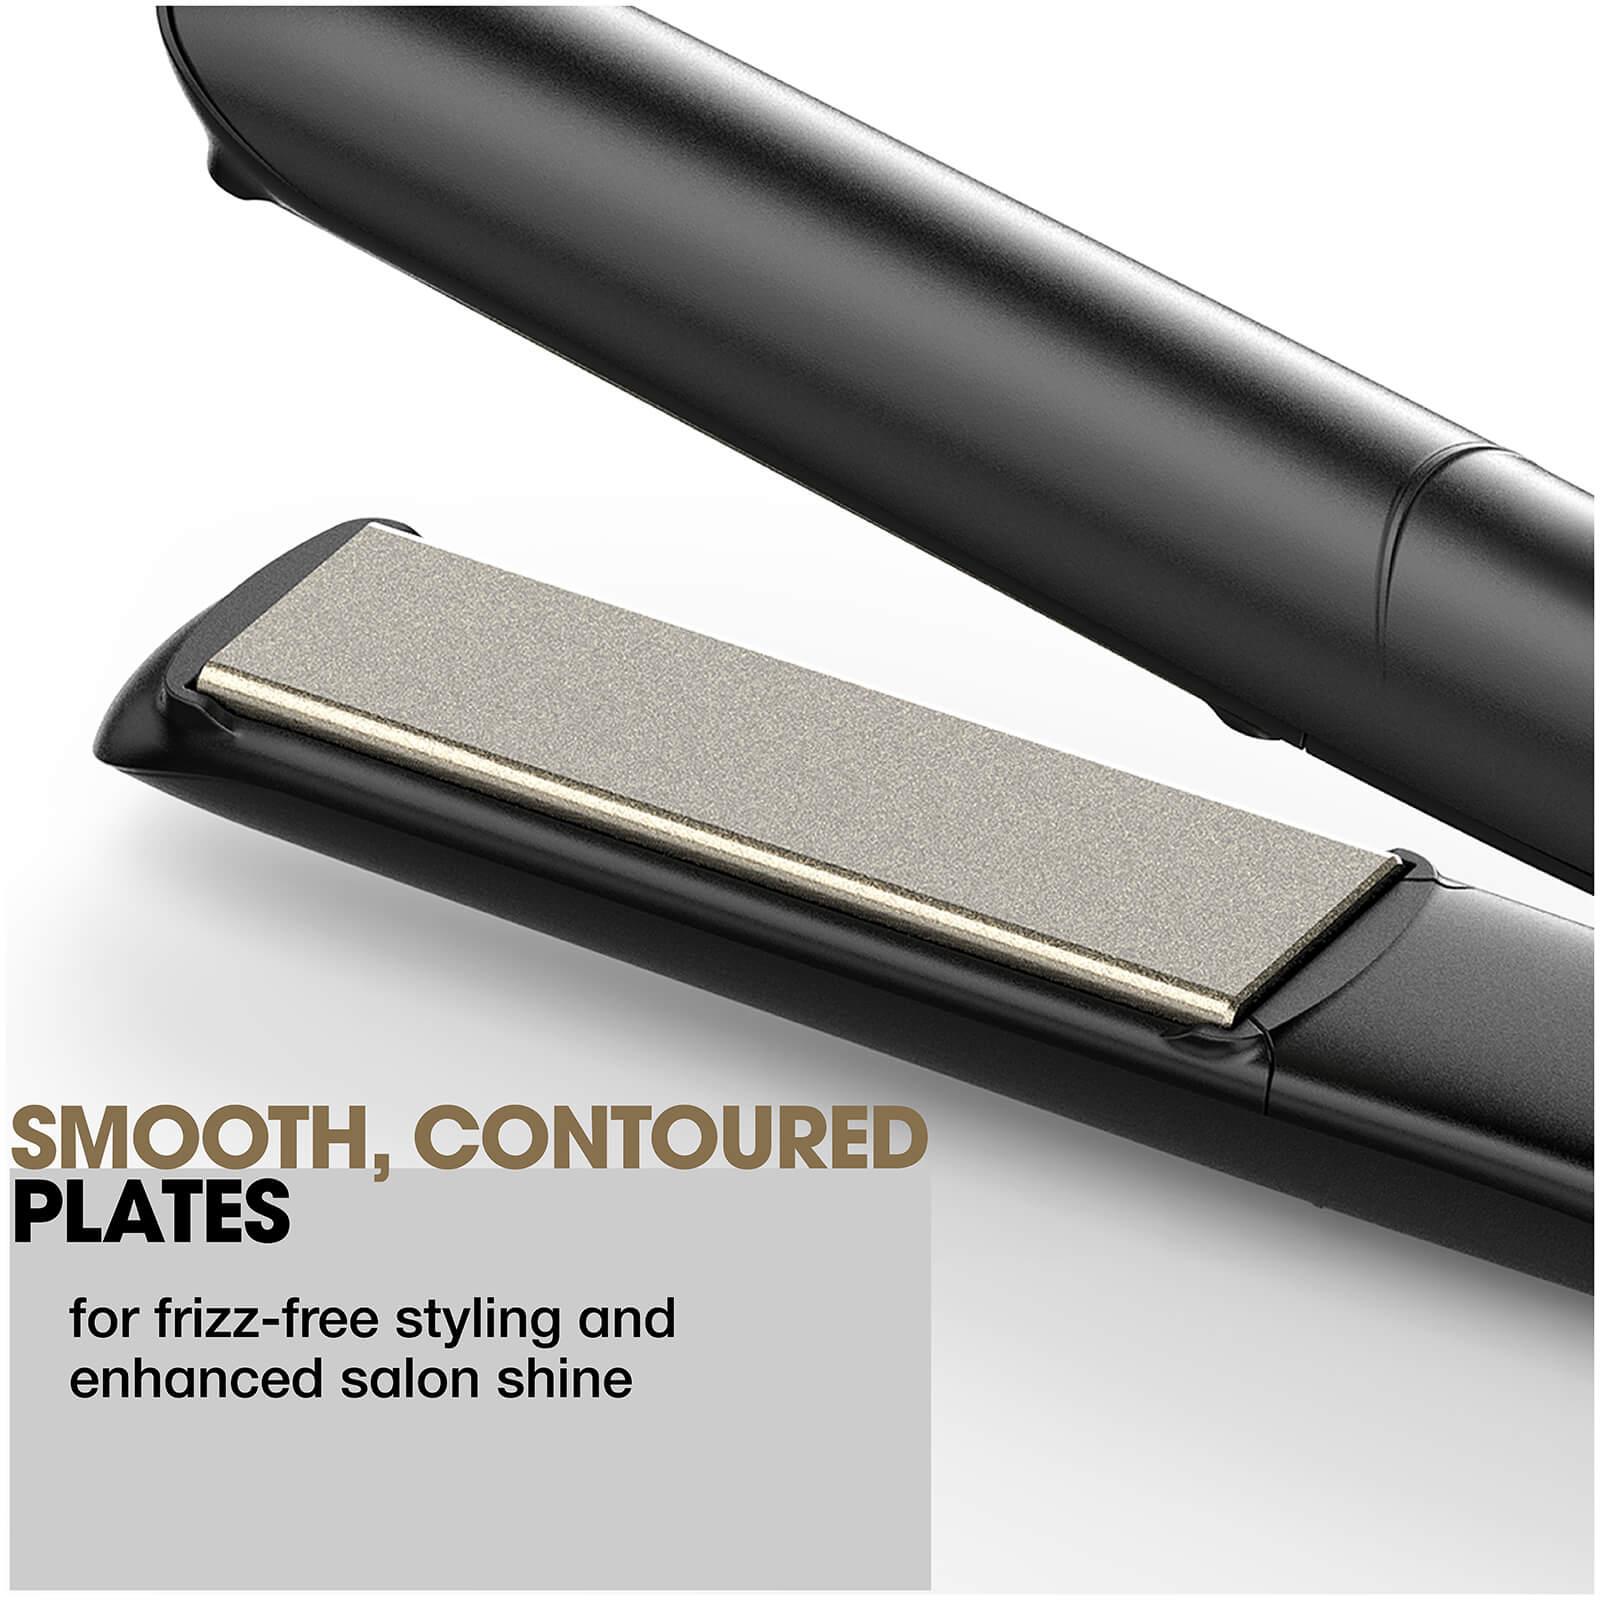 ghd gold® Professional Hair Straightener